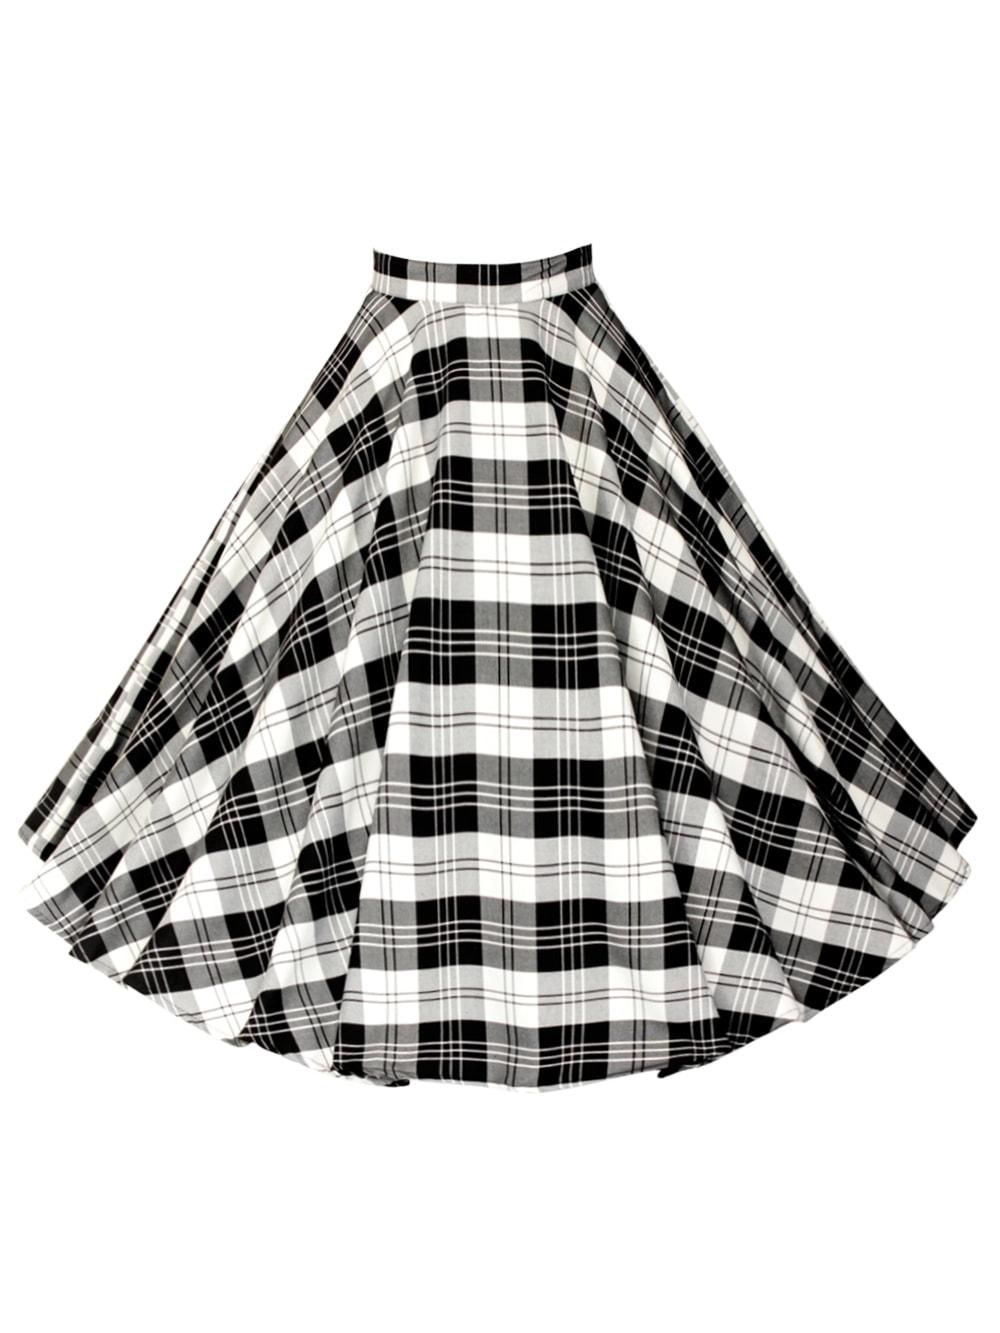 dfed253b51b0 1950s Circle Skirt Black White Tartan from Vivien of Holloway